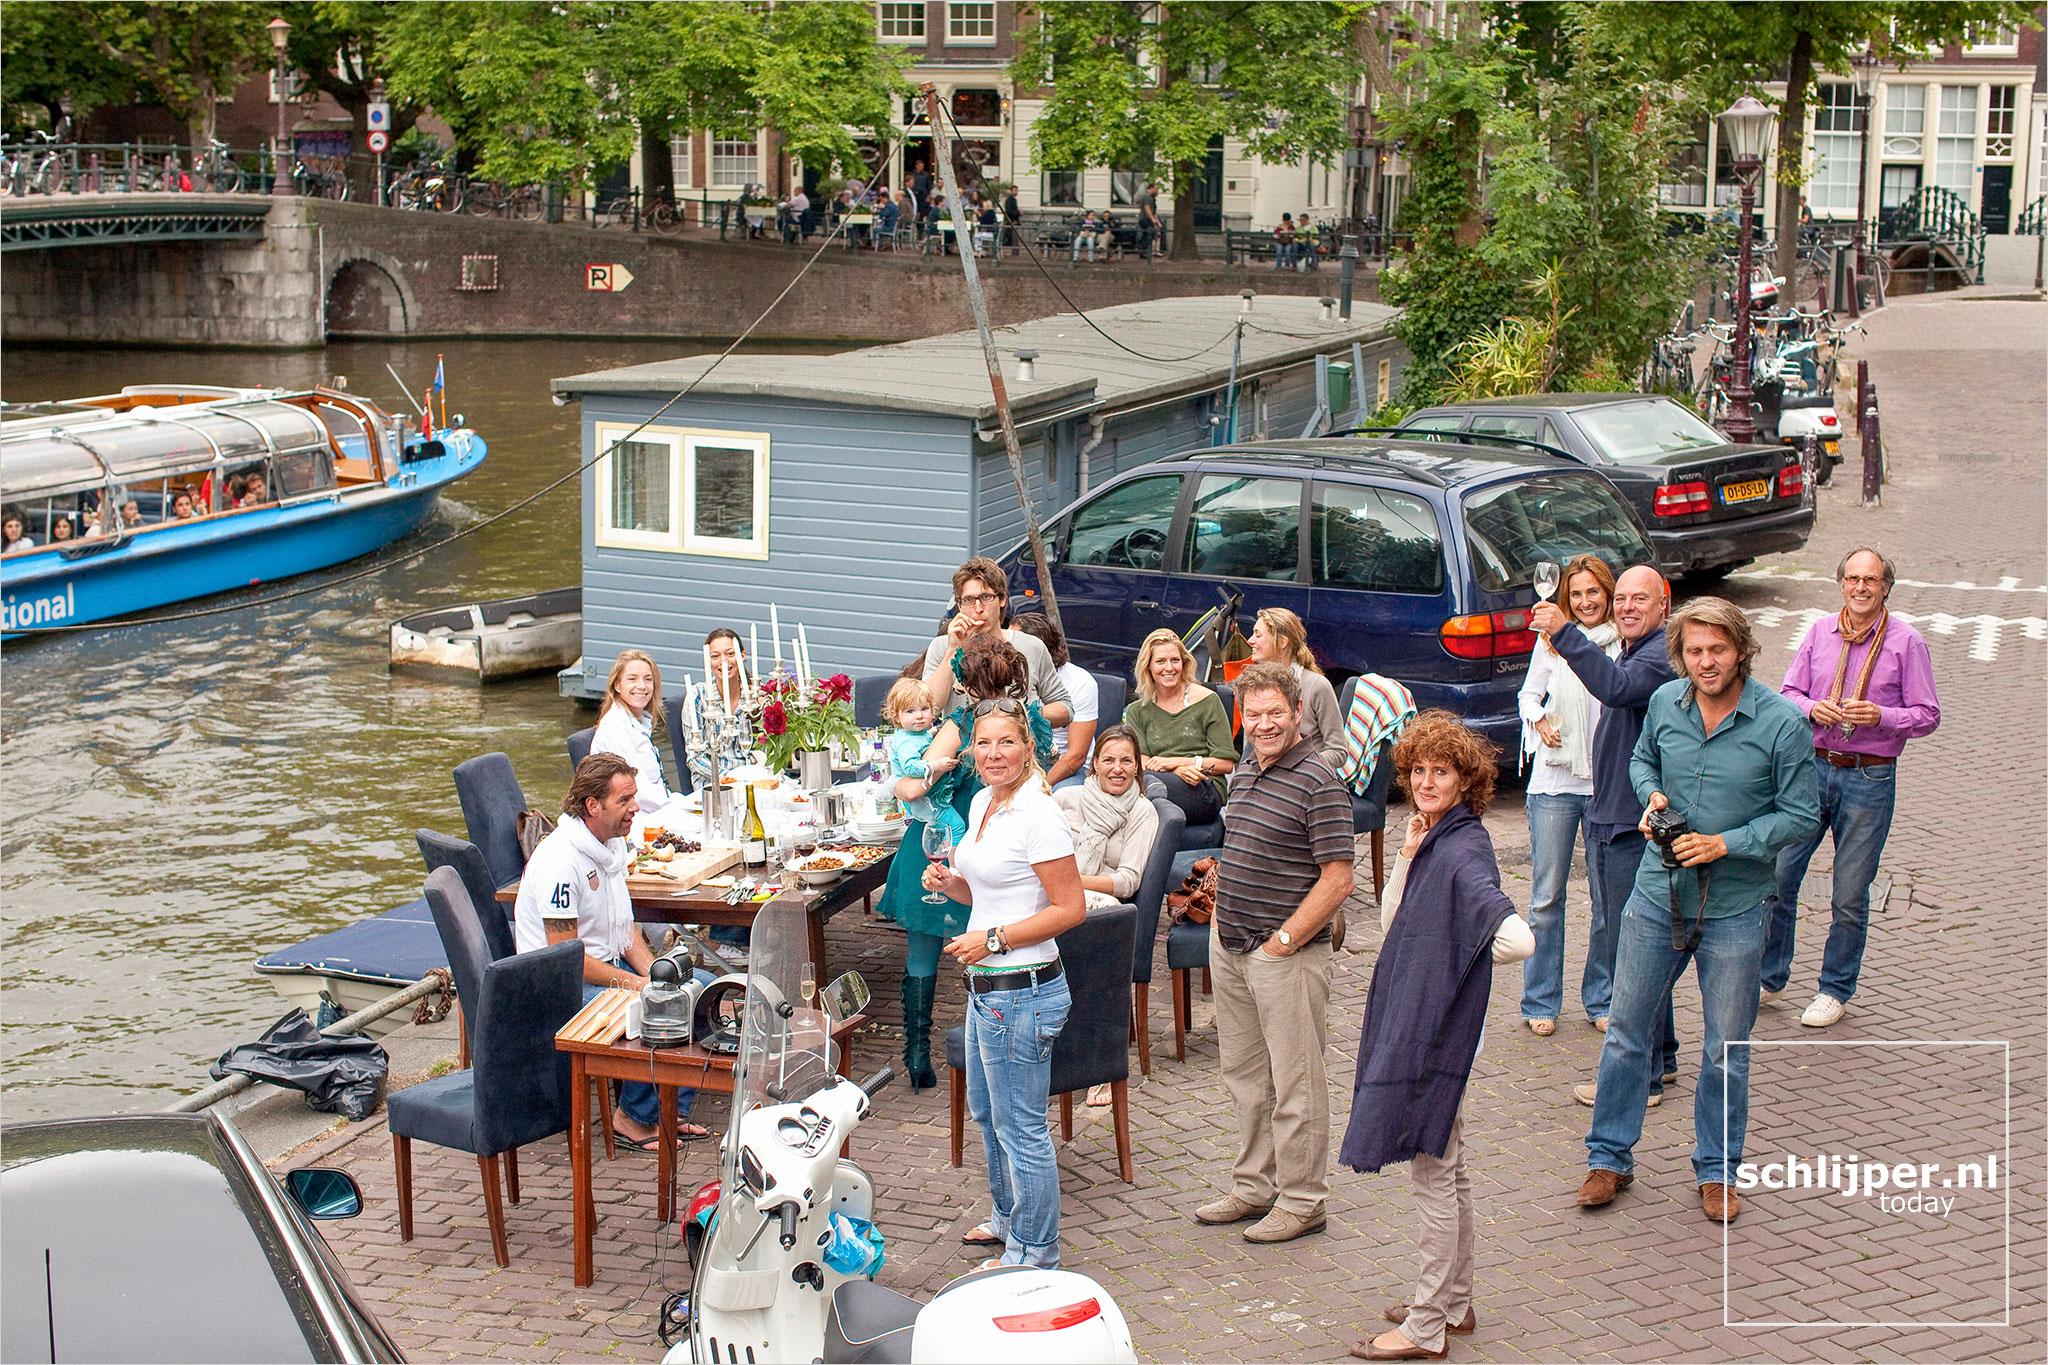 Nederland, Amsterdam, 25 juli 2010